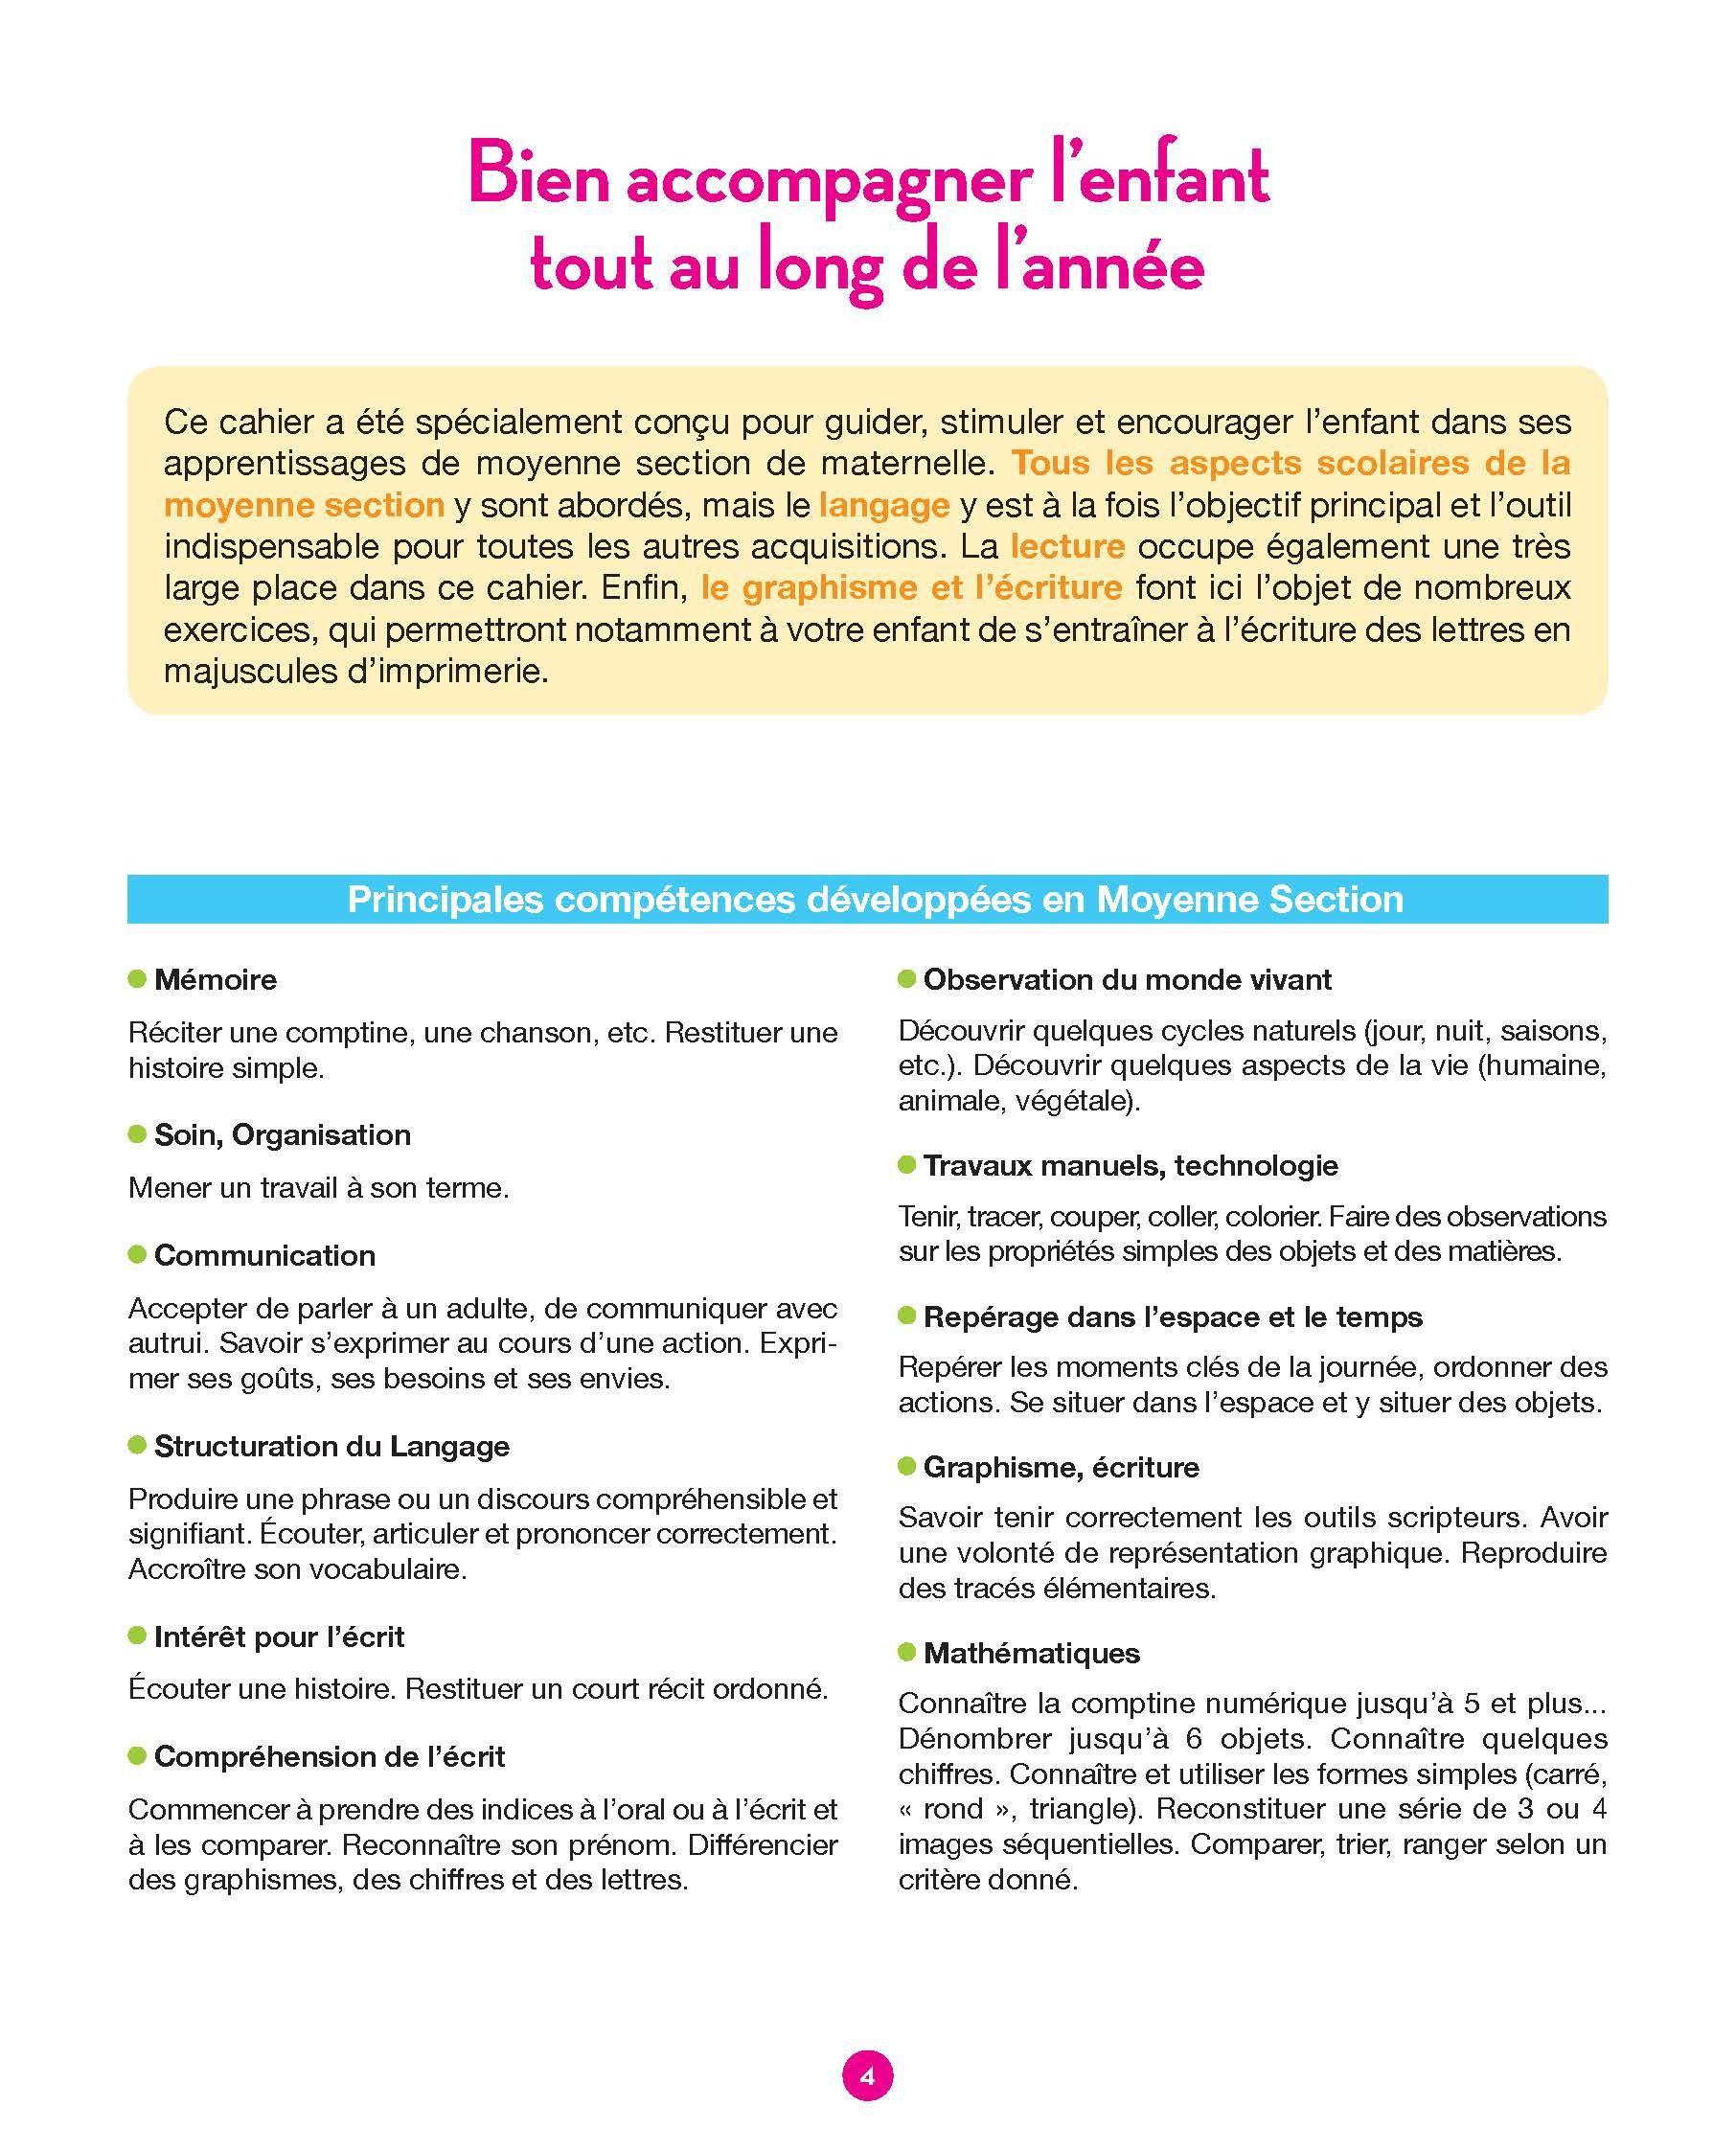 Hachette Education Toute Ma Maternelle Moyenne Section concernant Cours Moyenne Section Maternelle